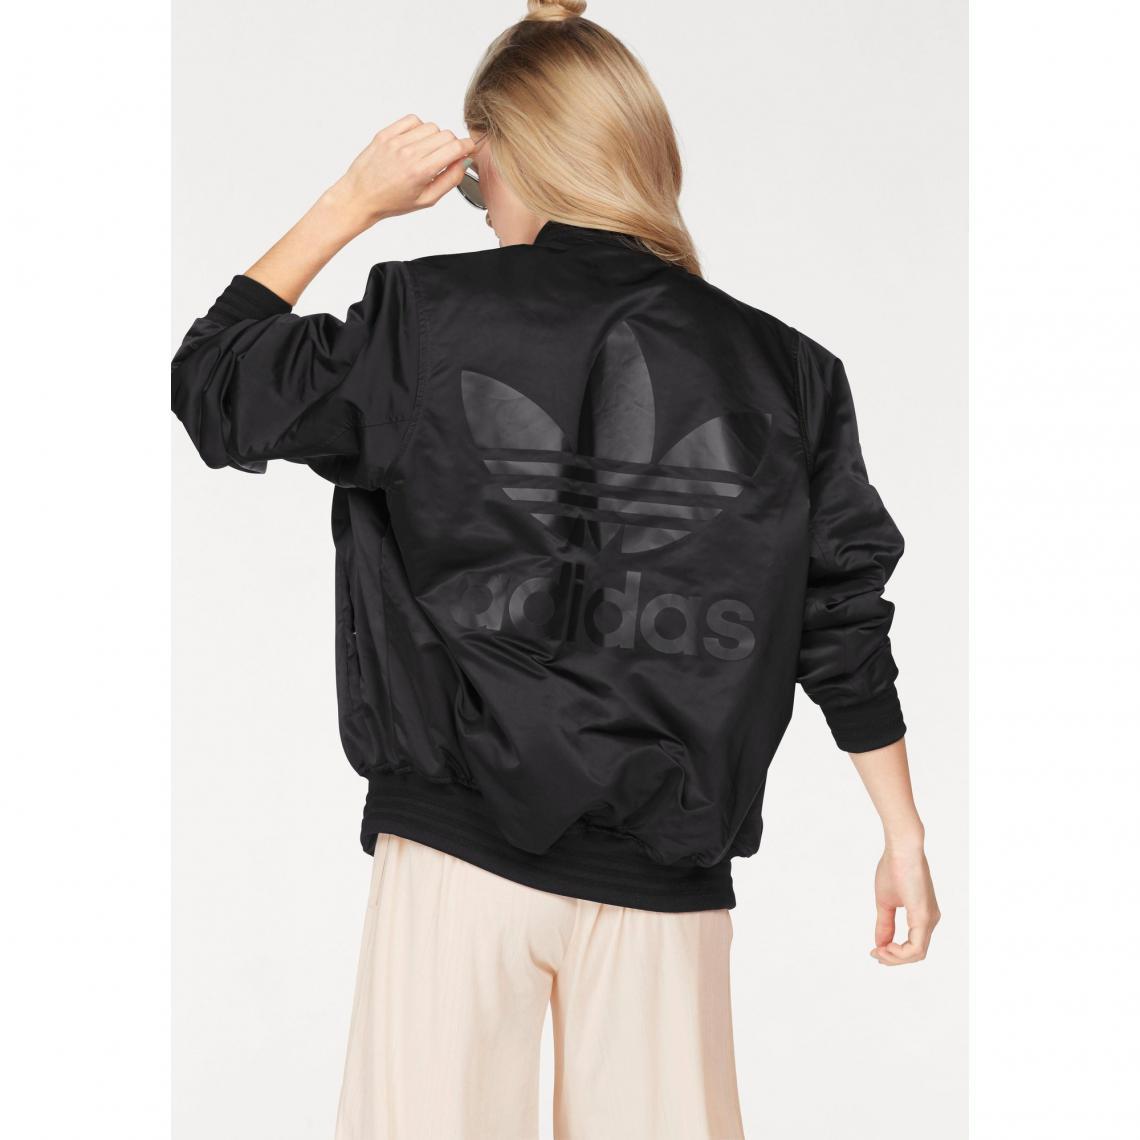 Blouson rembourré Stlying Compliments Jacket SST femme adidas ... 3f607377a73